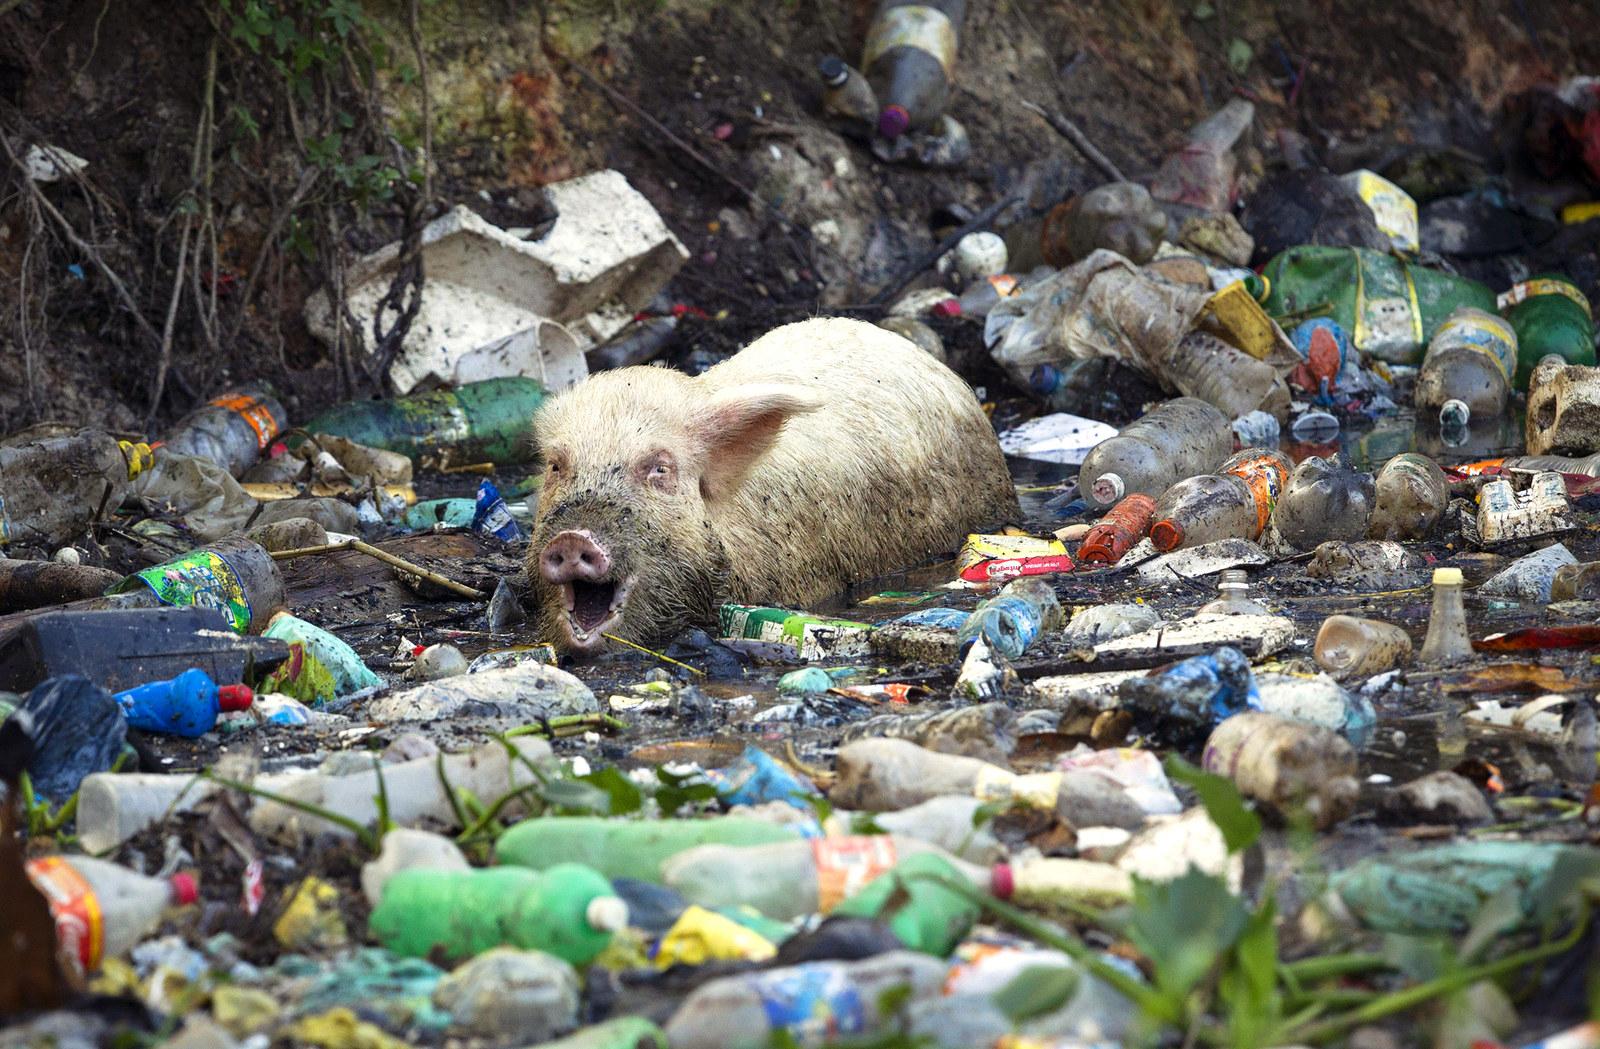 In this photo taken June 15, 2012, a pig eats from a trash-ridden creek in Rio de Janeiro, Brazil.